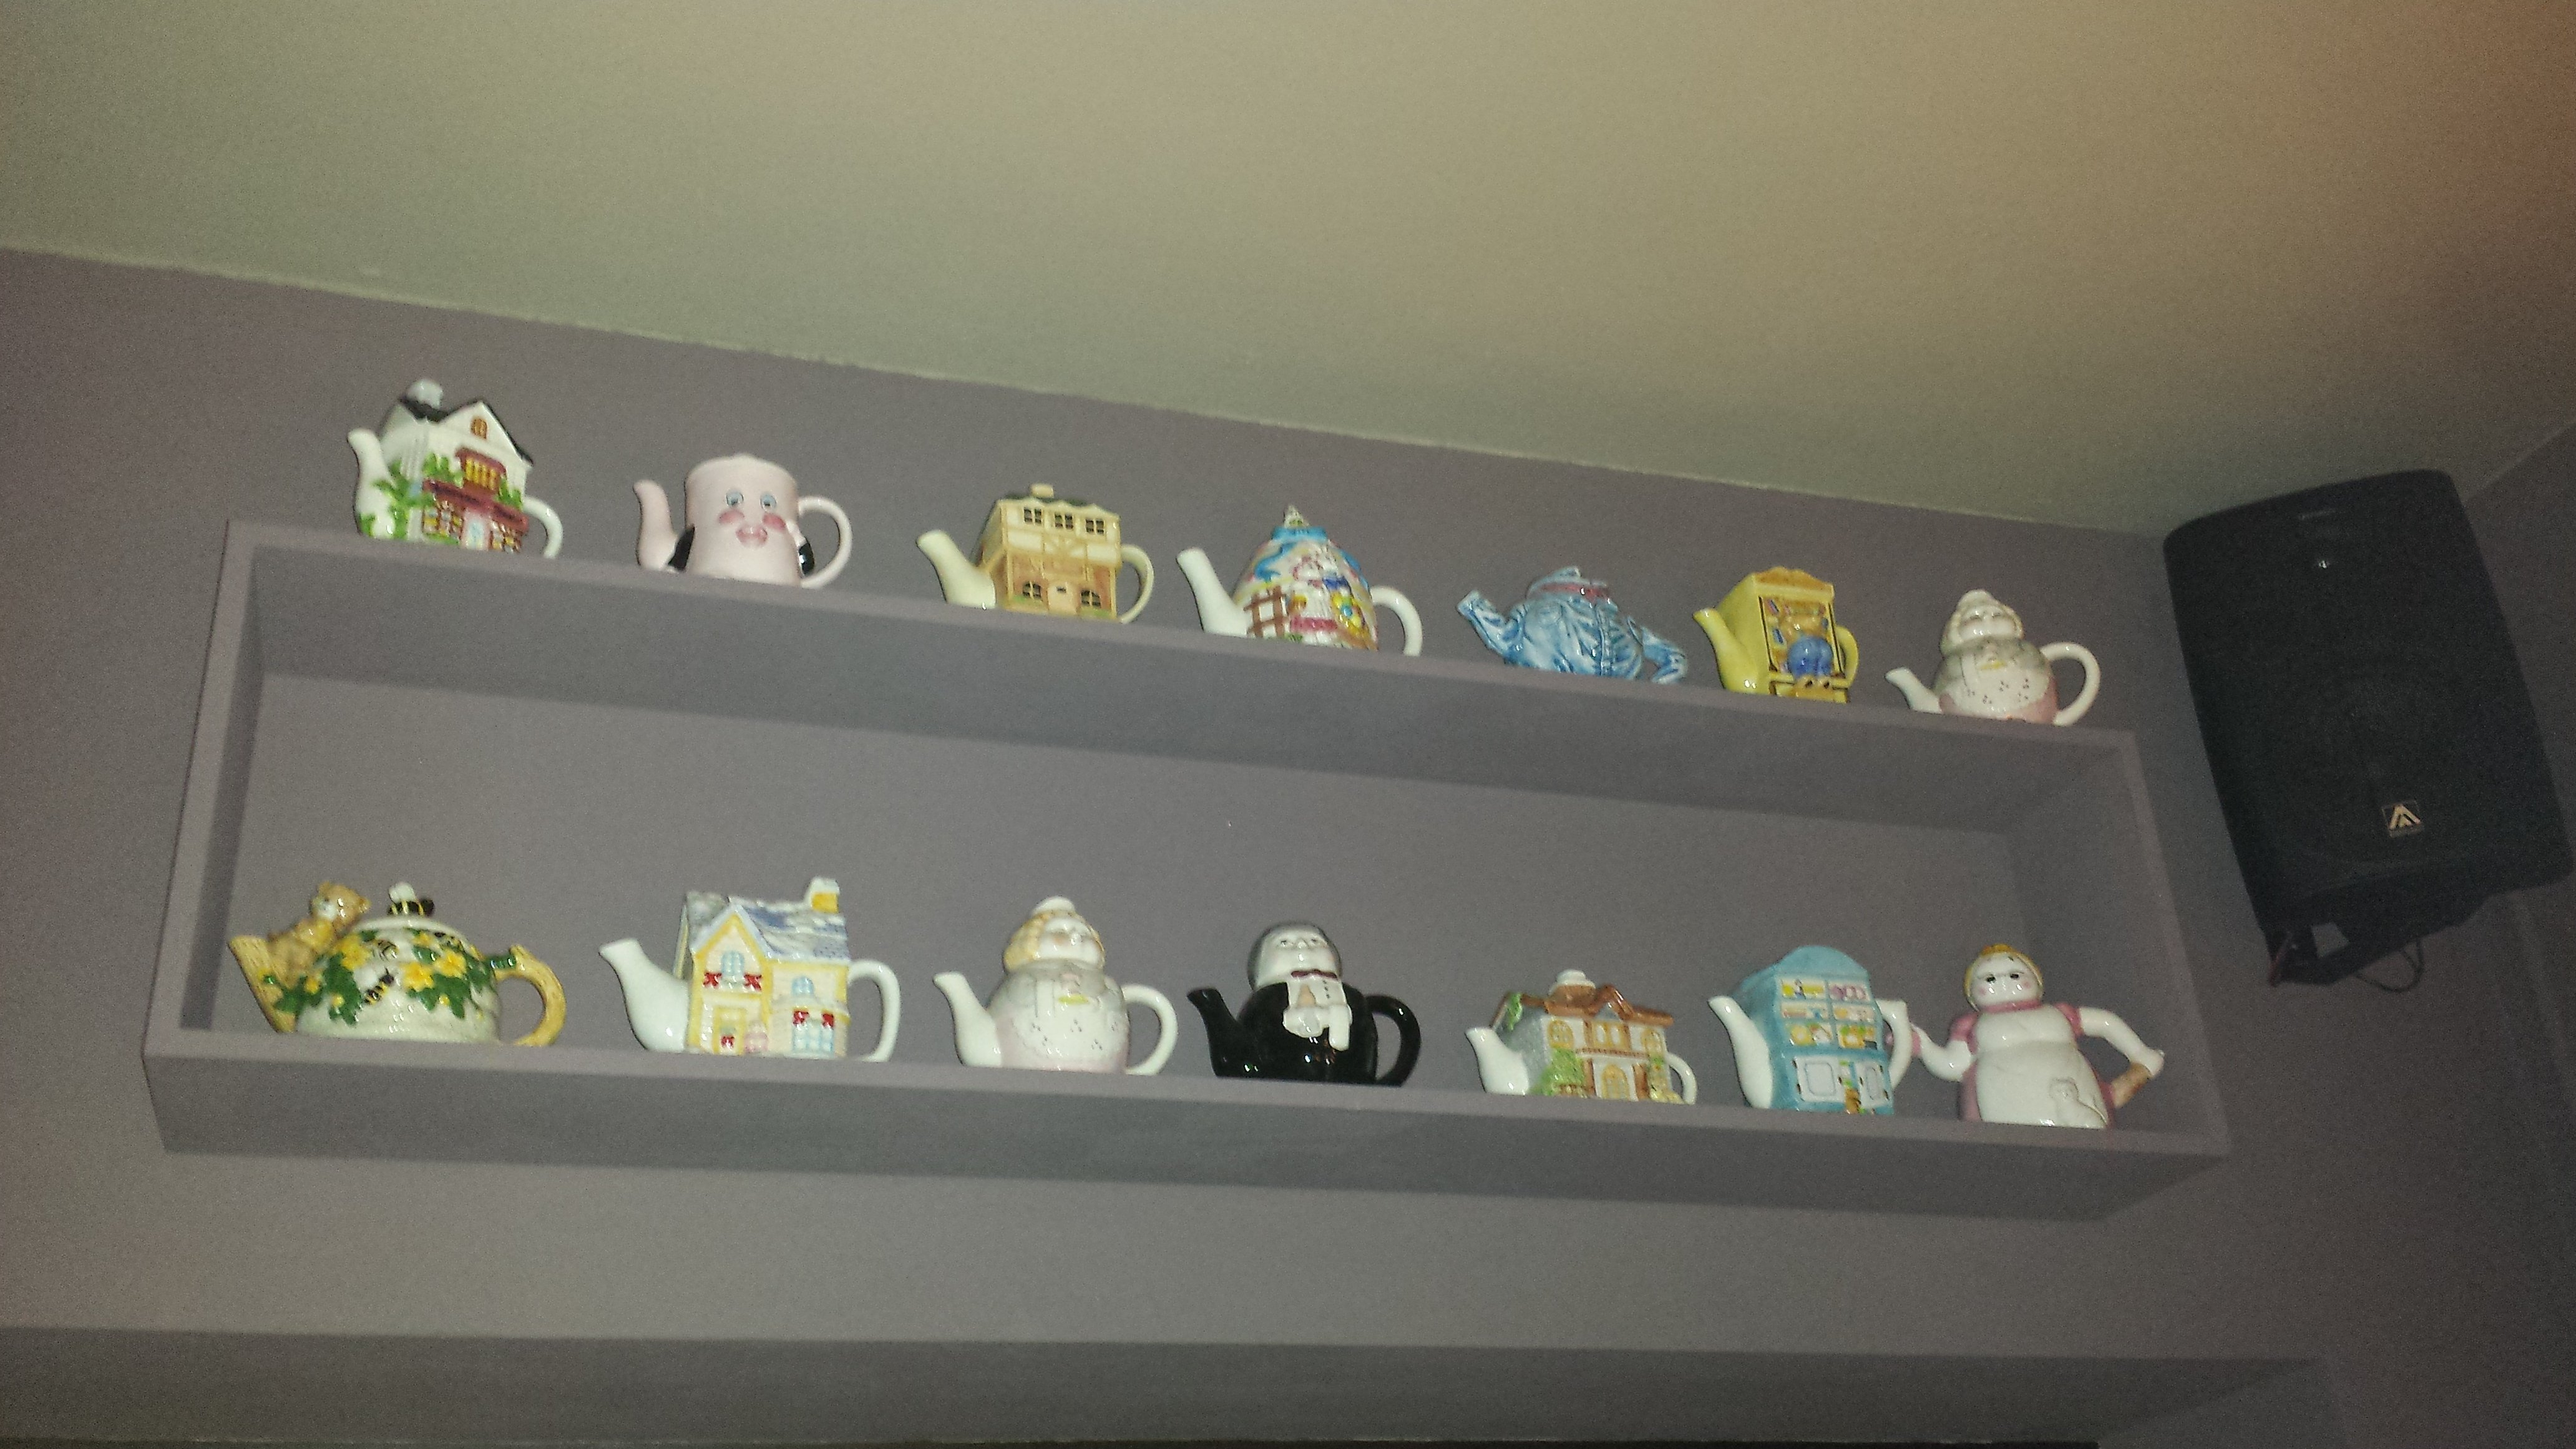 Koffie Lounge bar - Grashoek